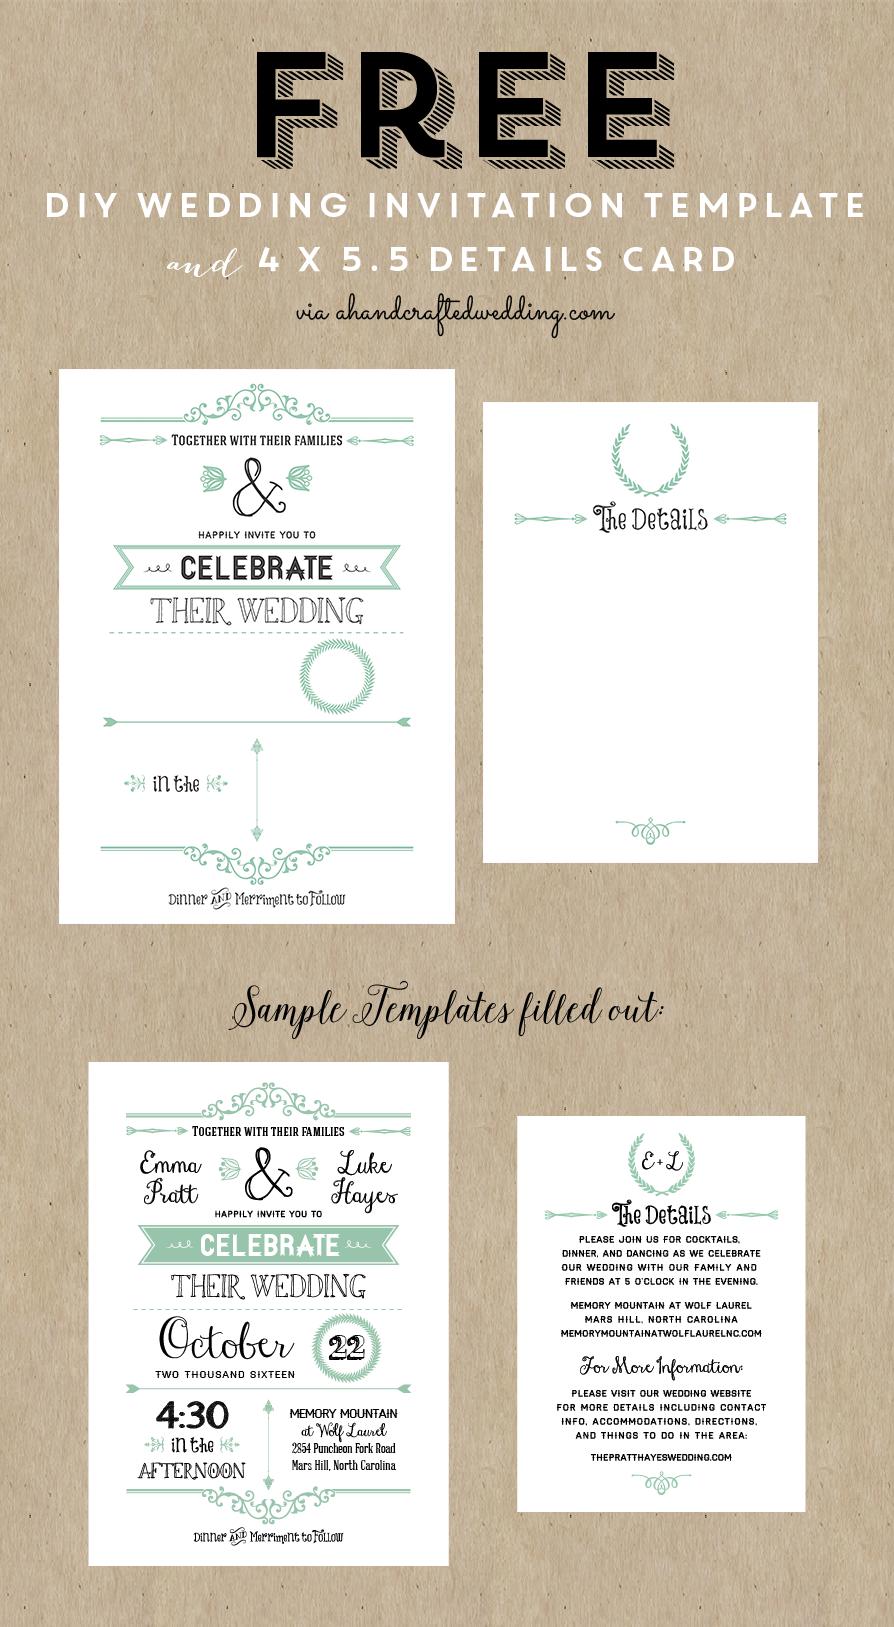 Free Printable Wedding Invitation Template | Wedding | Pinterest - Free Printable Wedding Menu Card Templates